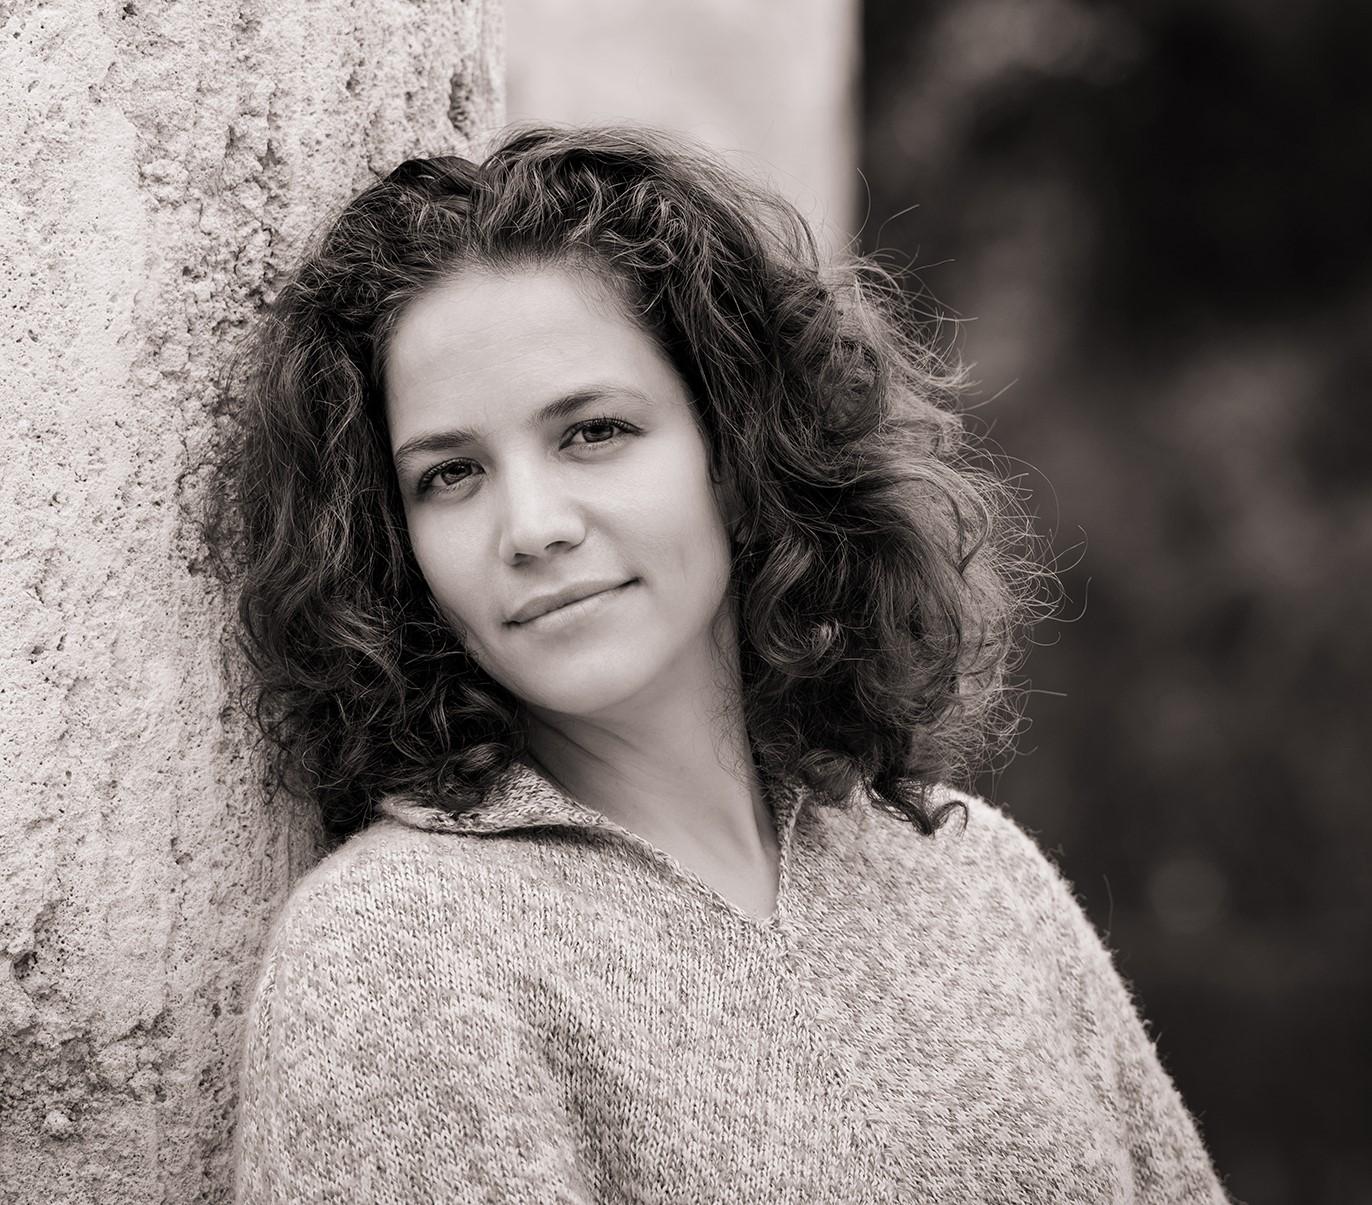 Sólyom, Anna - Sandra Bruna